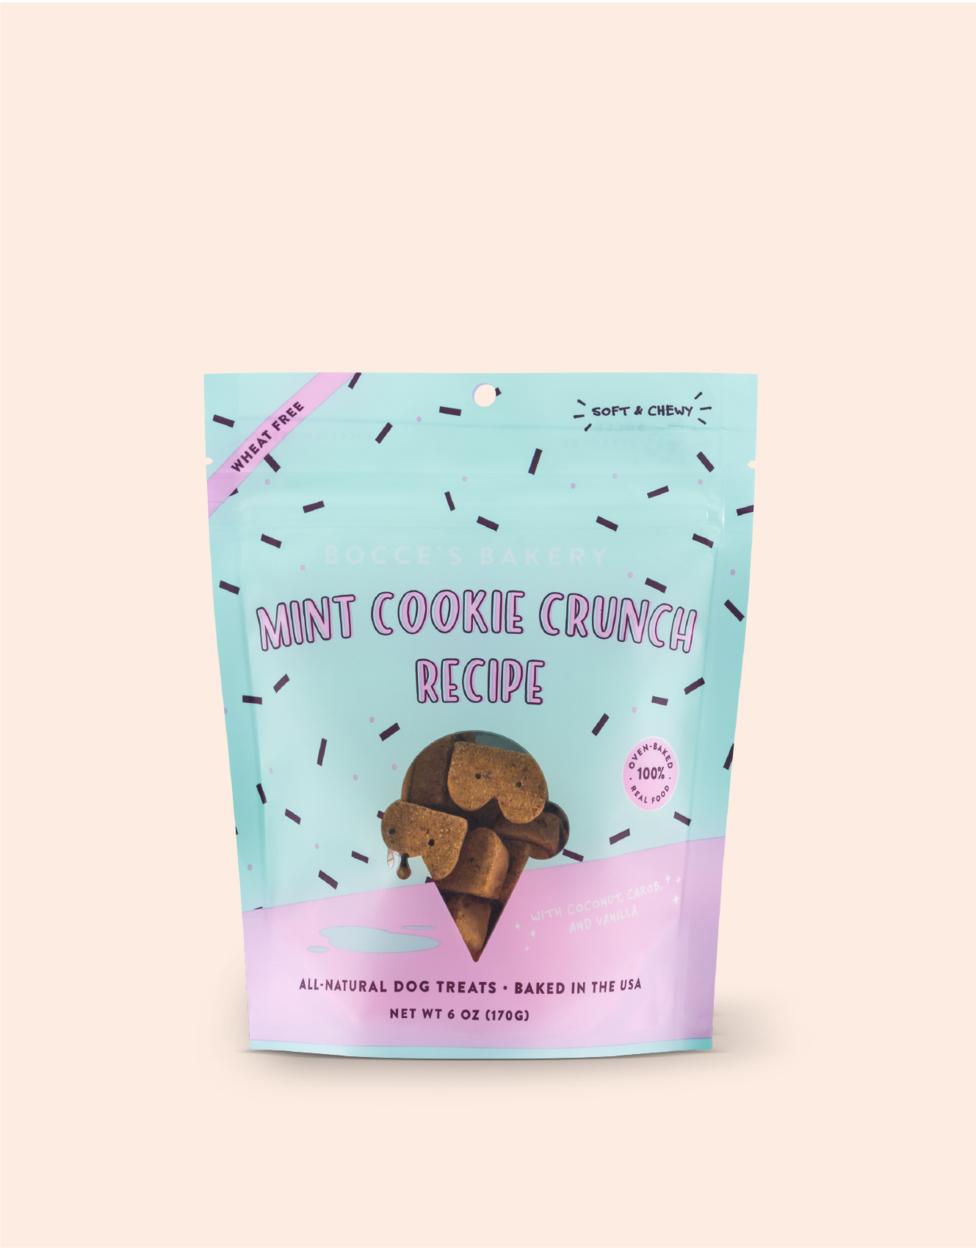 Bocce's Bakery Scoop Shop Mint Cookie Crunch Dog Treats, 6-oz